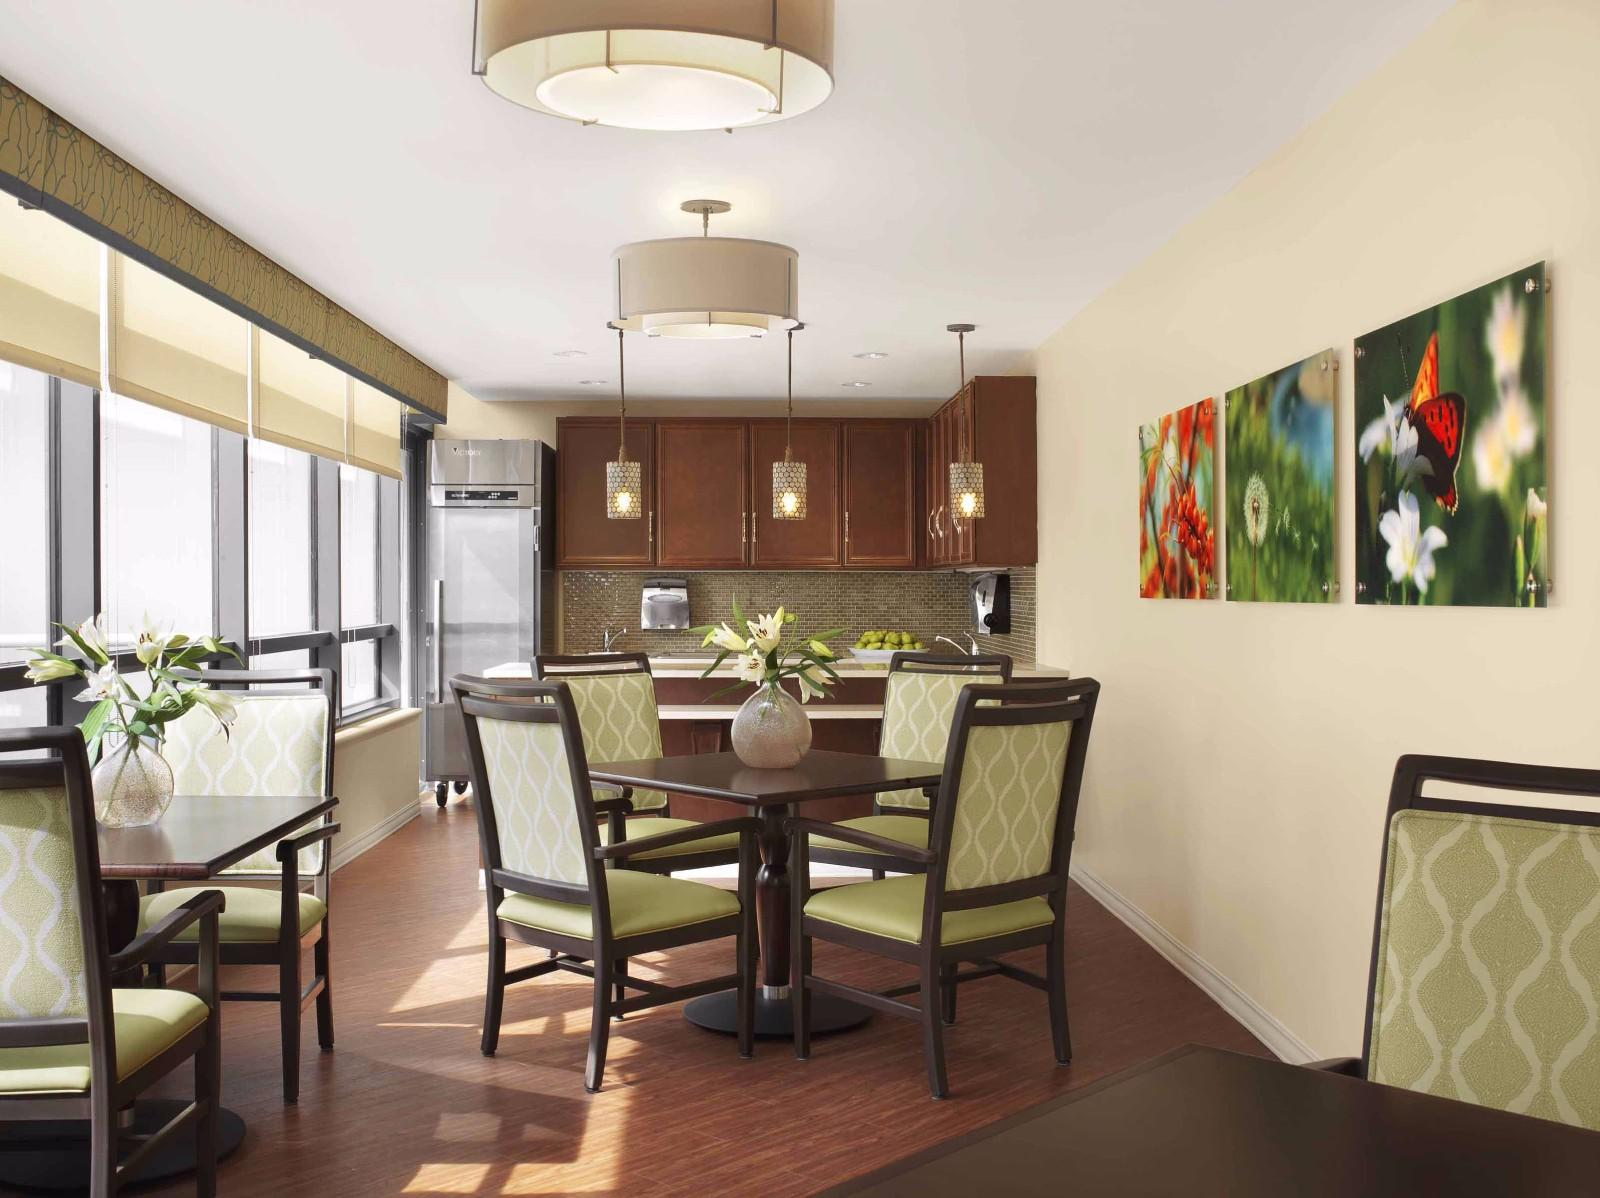 YSK Furniture at discount senior living furniture quality room decoration-1